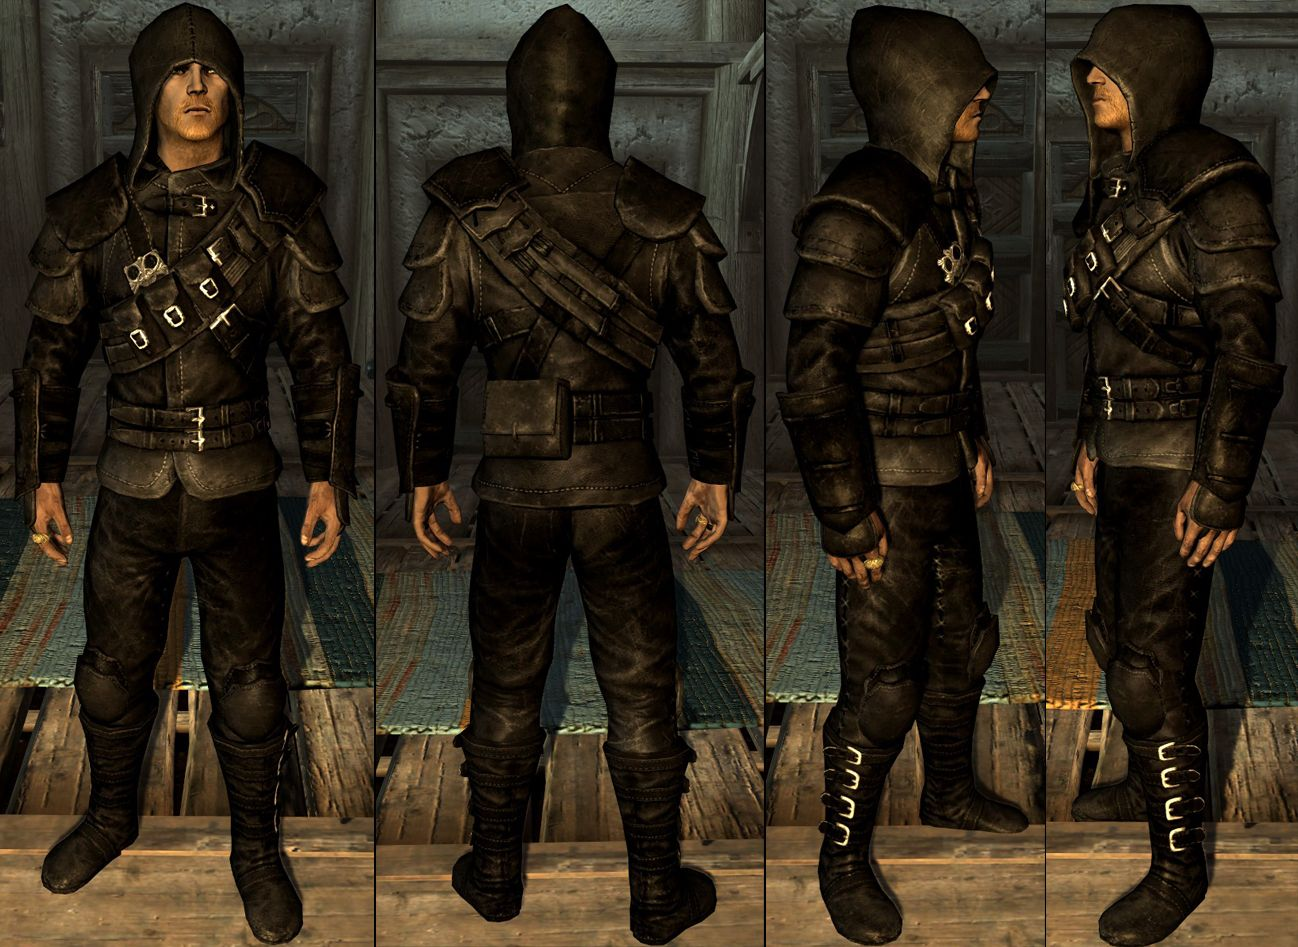 Black leather gloves skyrim - Skyrim Thieves Guild Armor Google Search